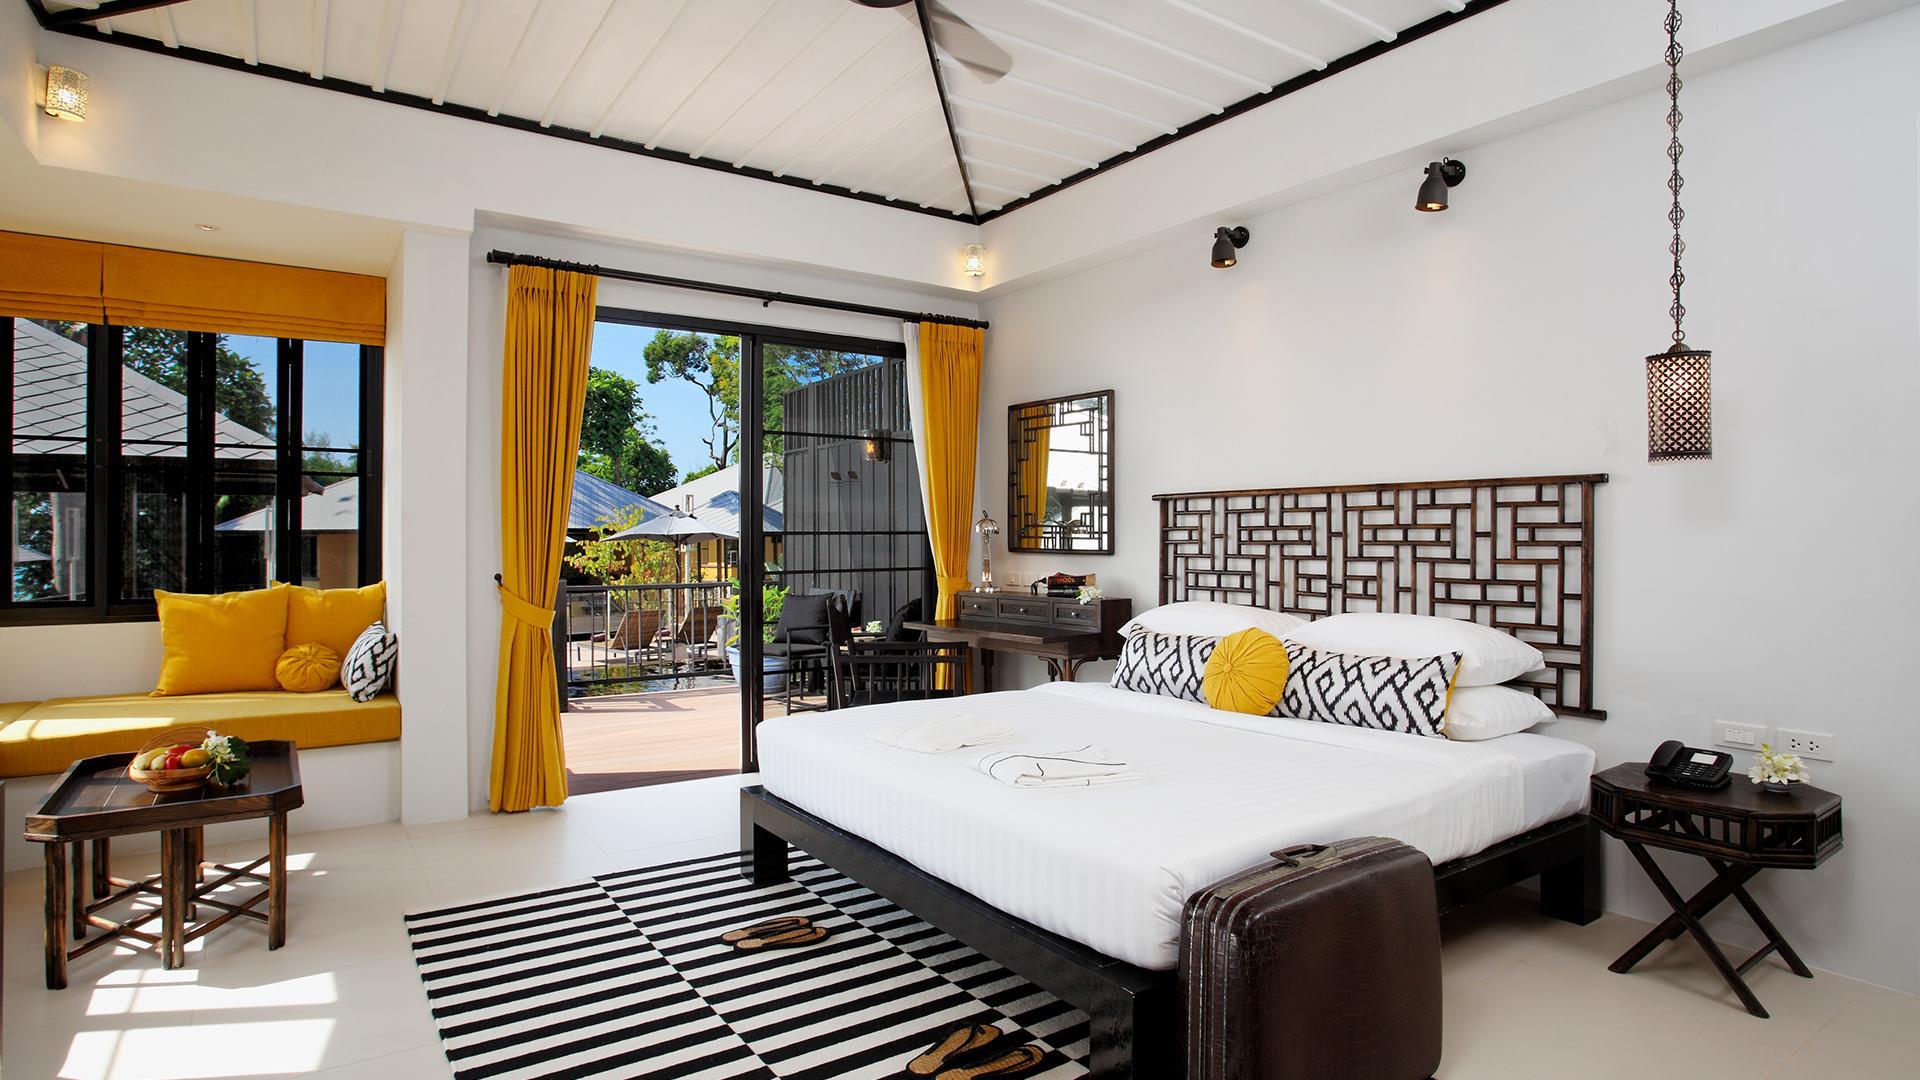 Hibiscus Pool Access image 1 at Moracea by Khao Lak Resort by Amphoe Takua Pa, Chang Wat Phang-nga, Thailand